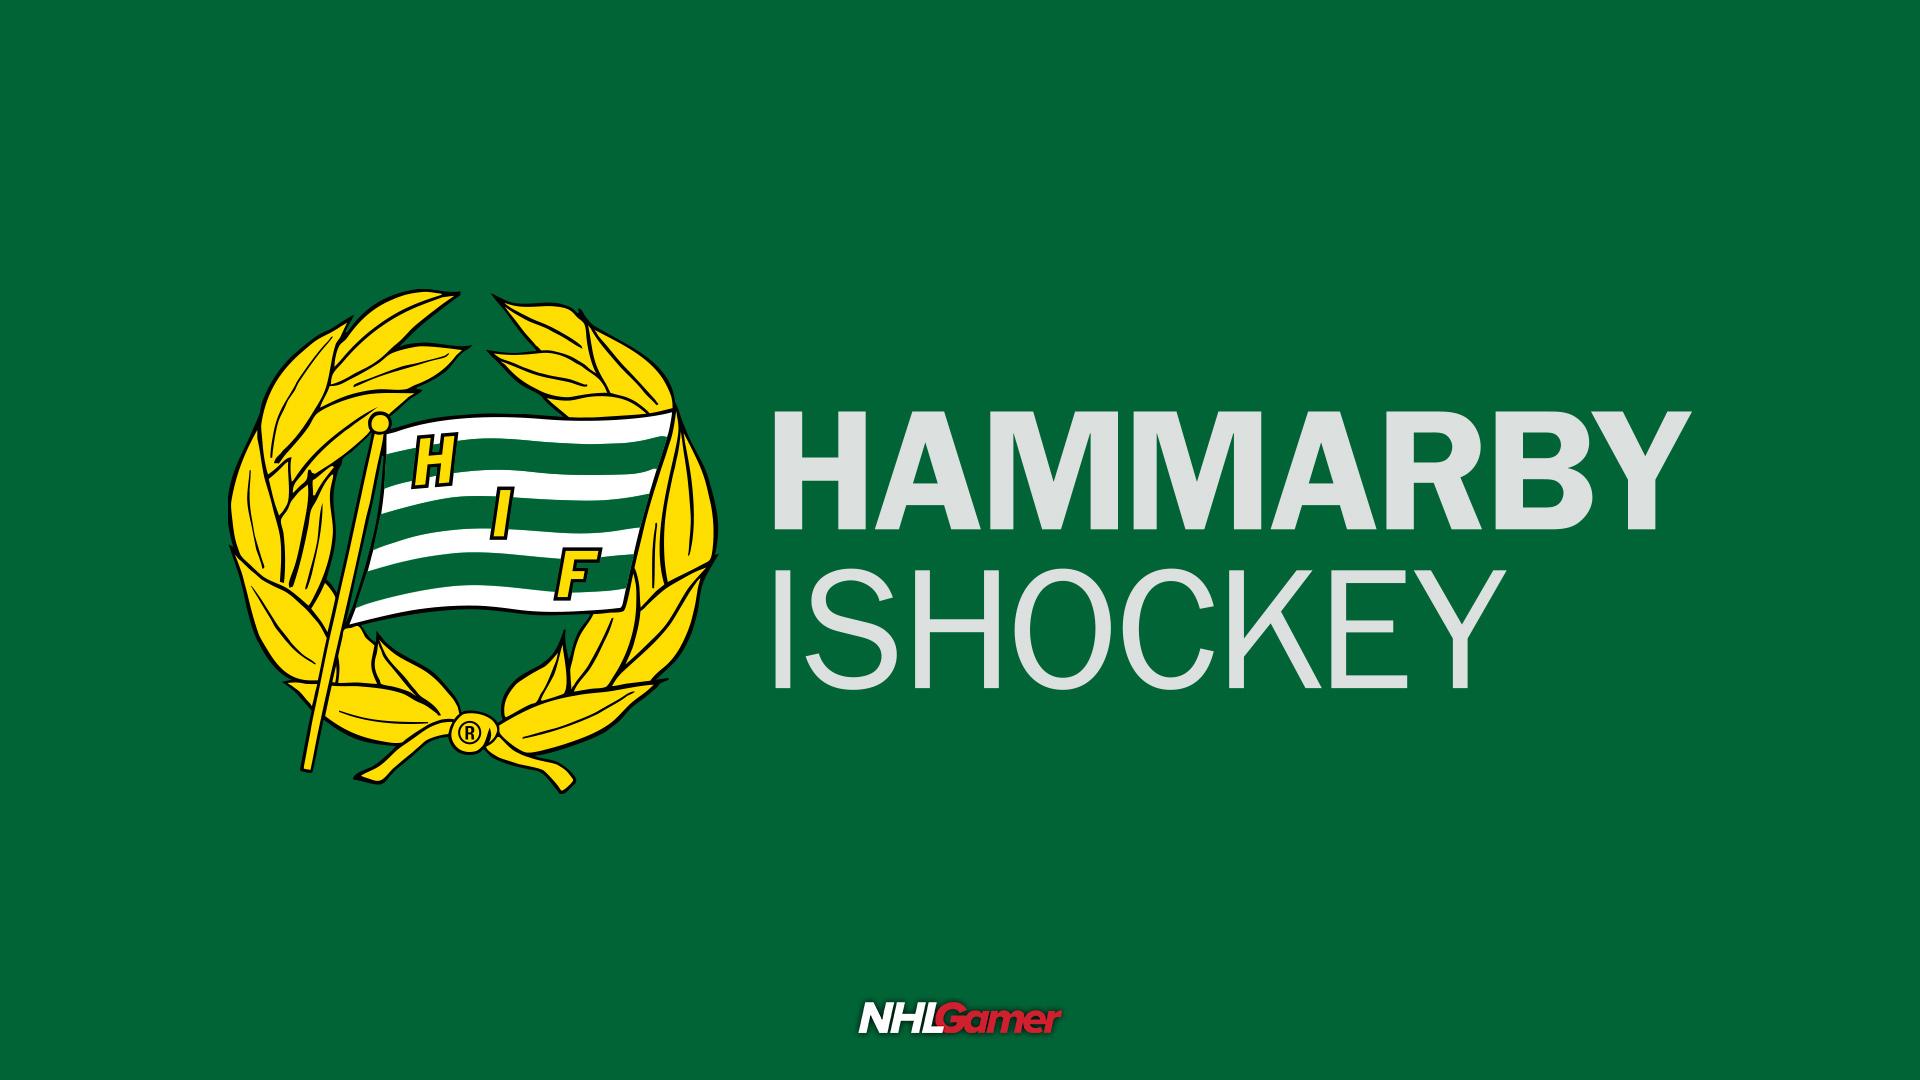 Hammarby_Ishockey_Cover.jpg